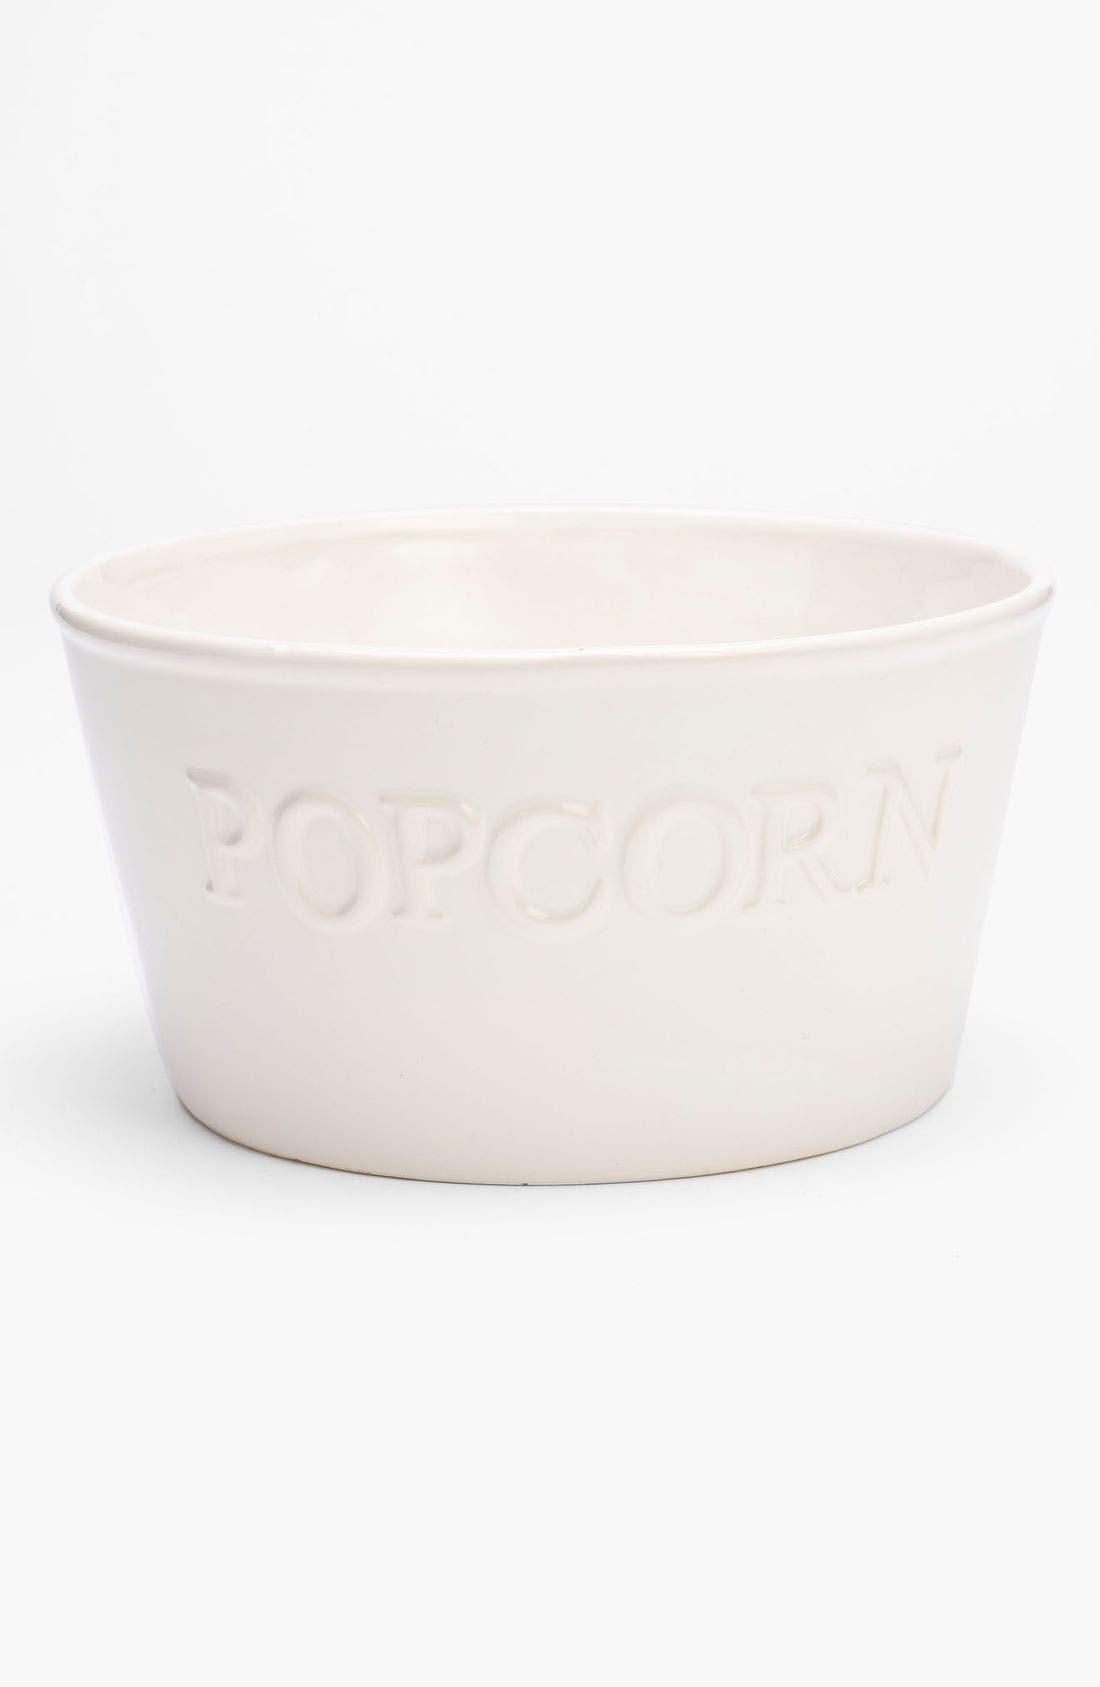 Alternate Image 1 Selected - Torre & Tagus 'Large Popcorn' Ceramic Bowl